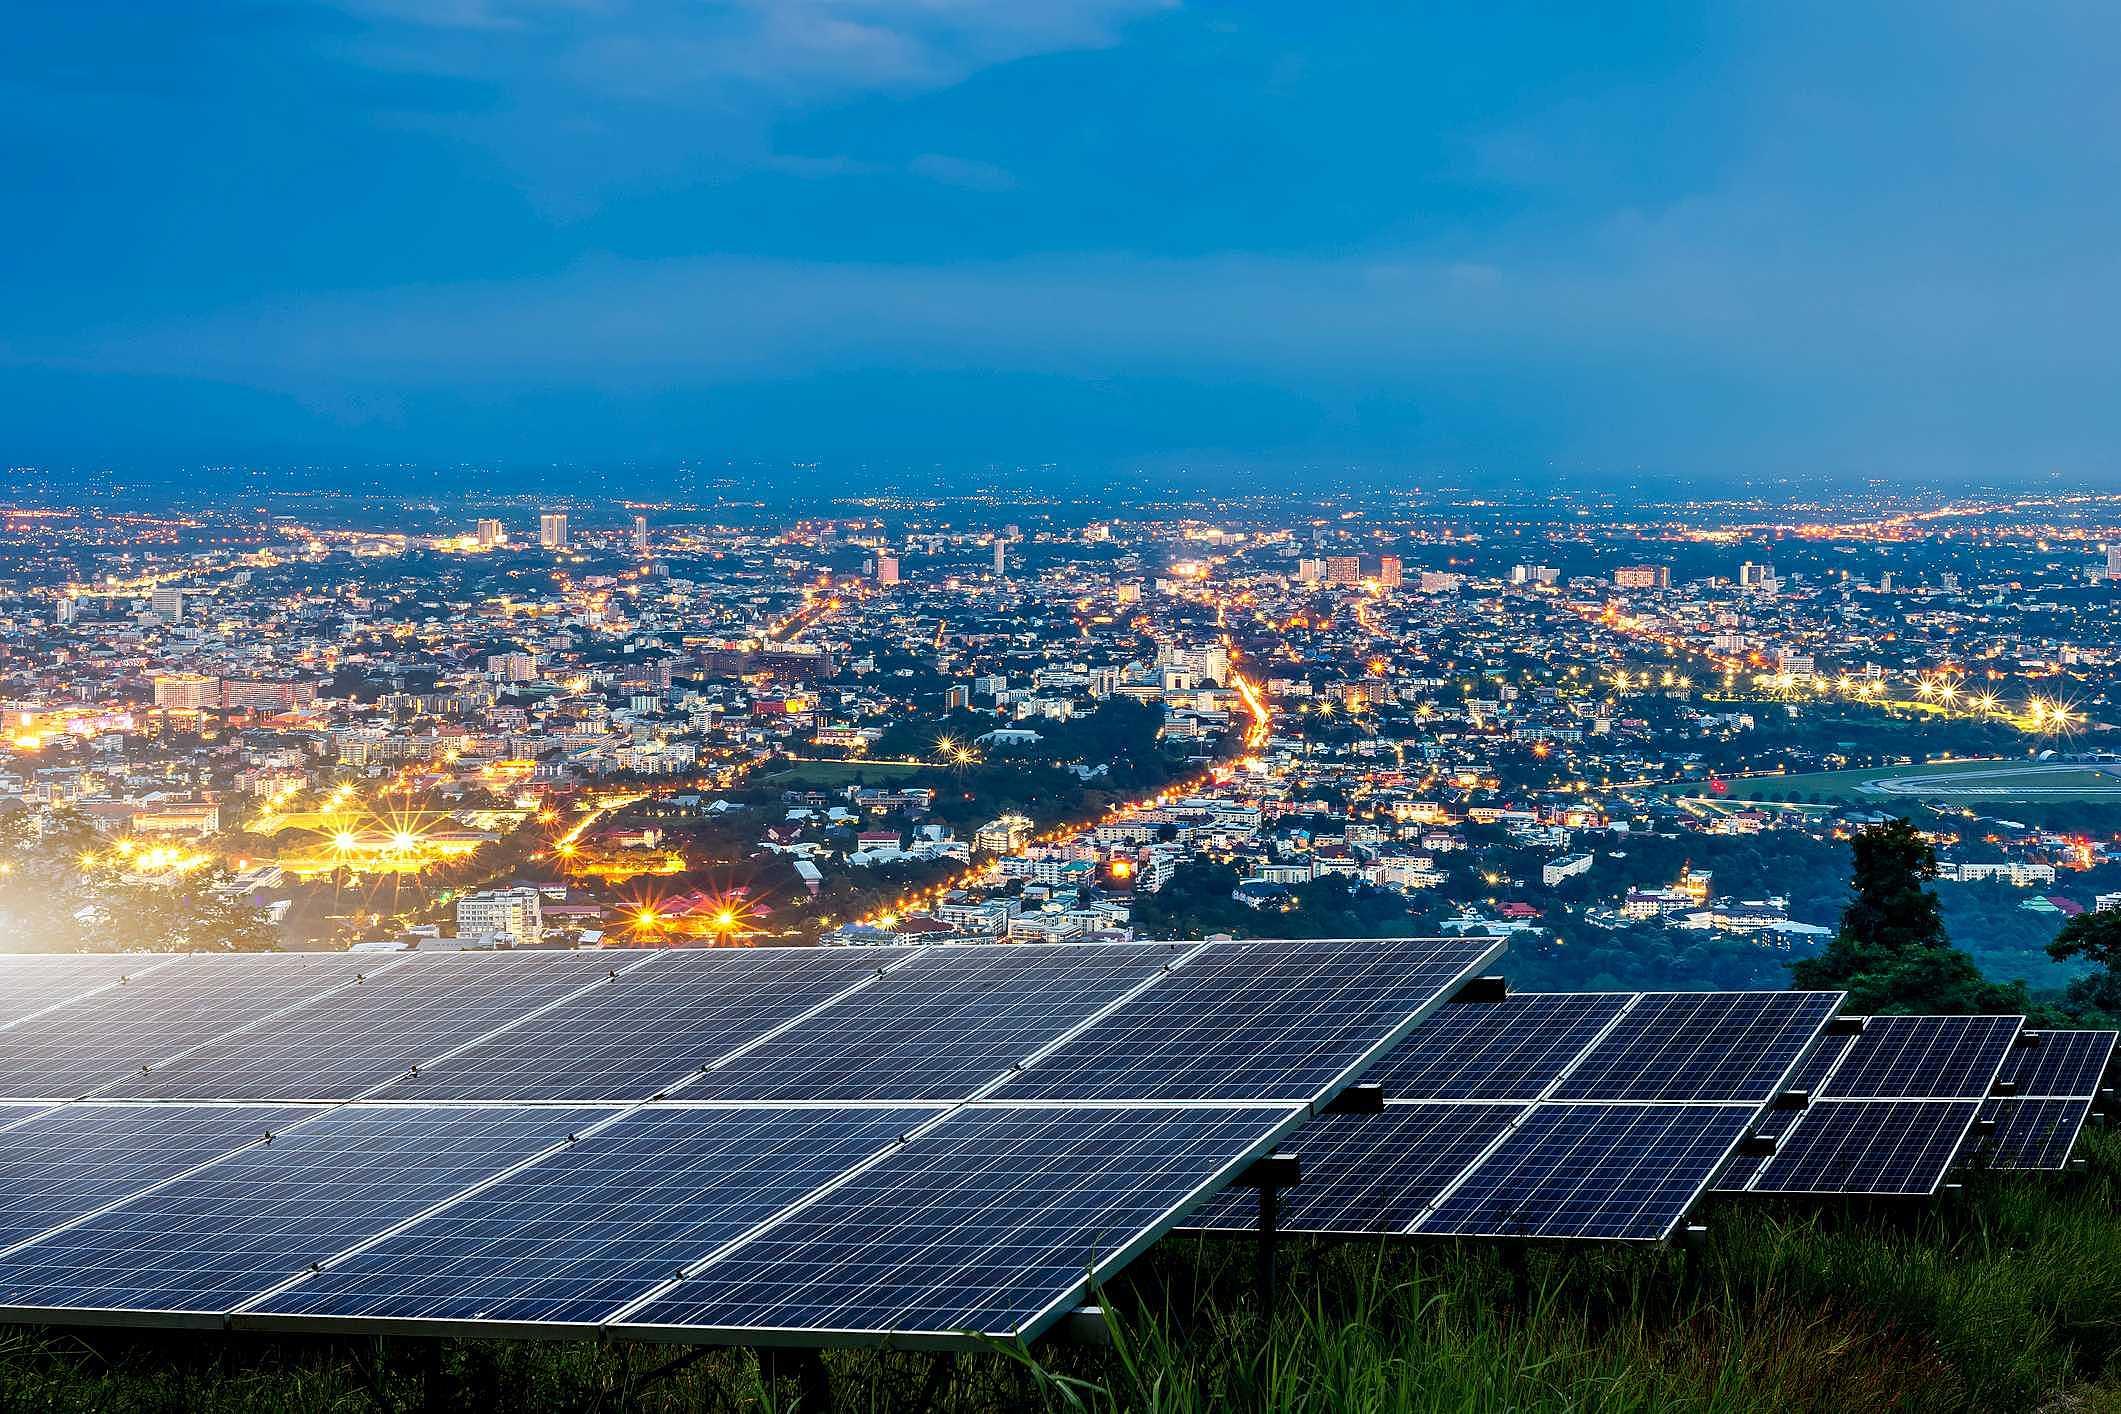 Energia solar funciona à noite? Venha descobrir!